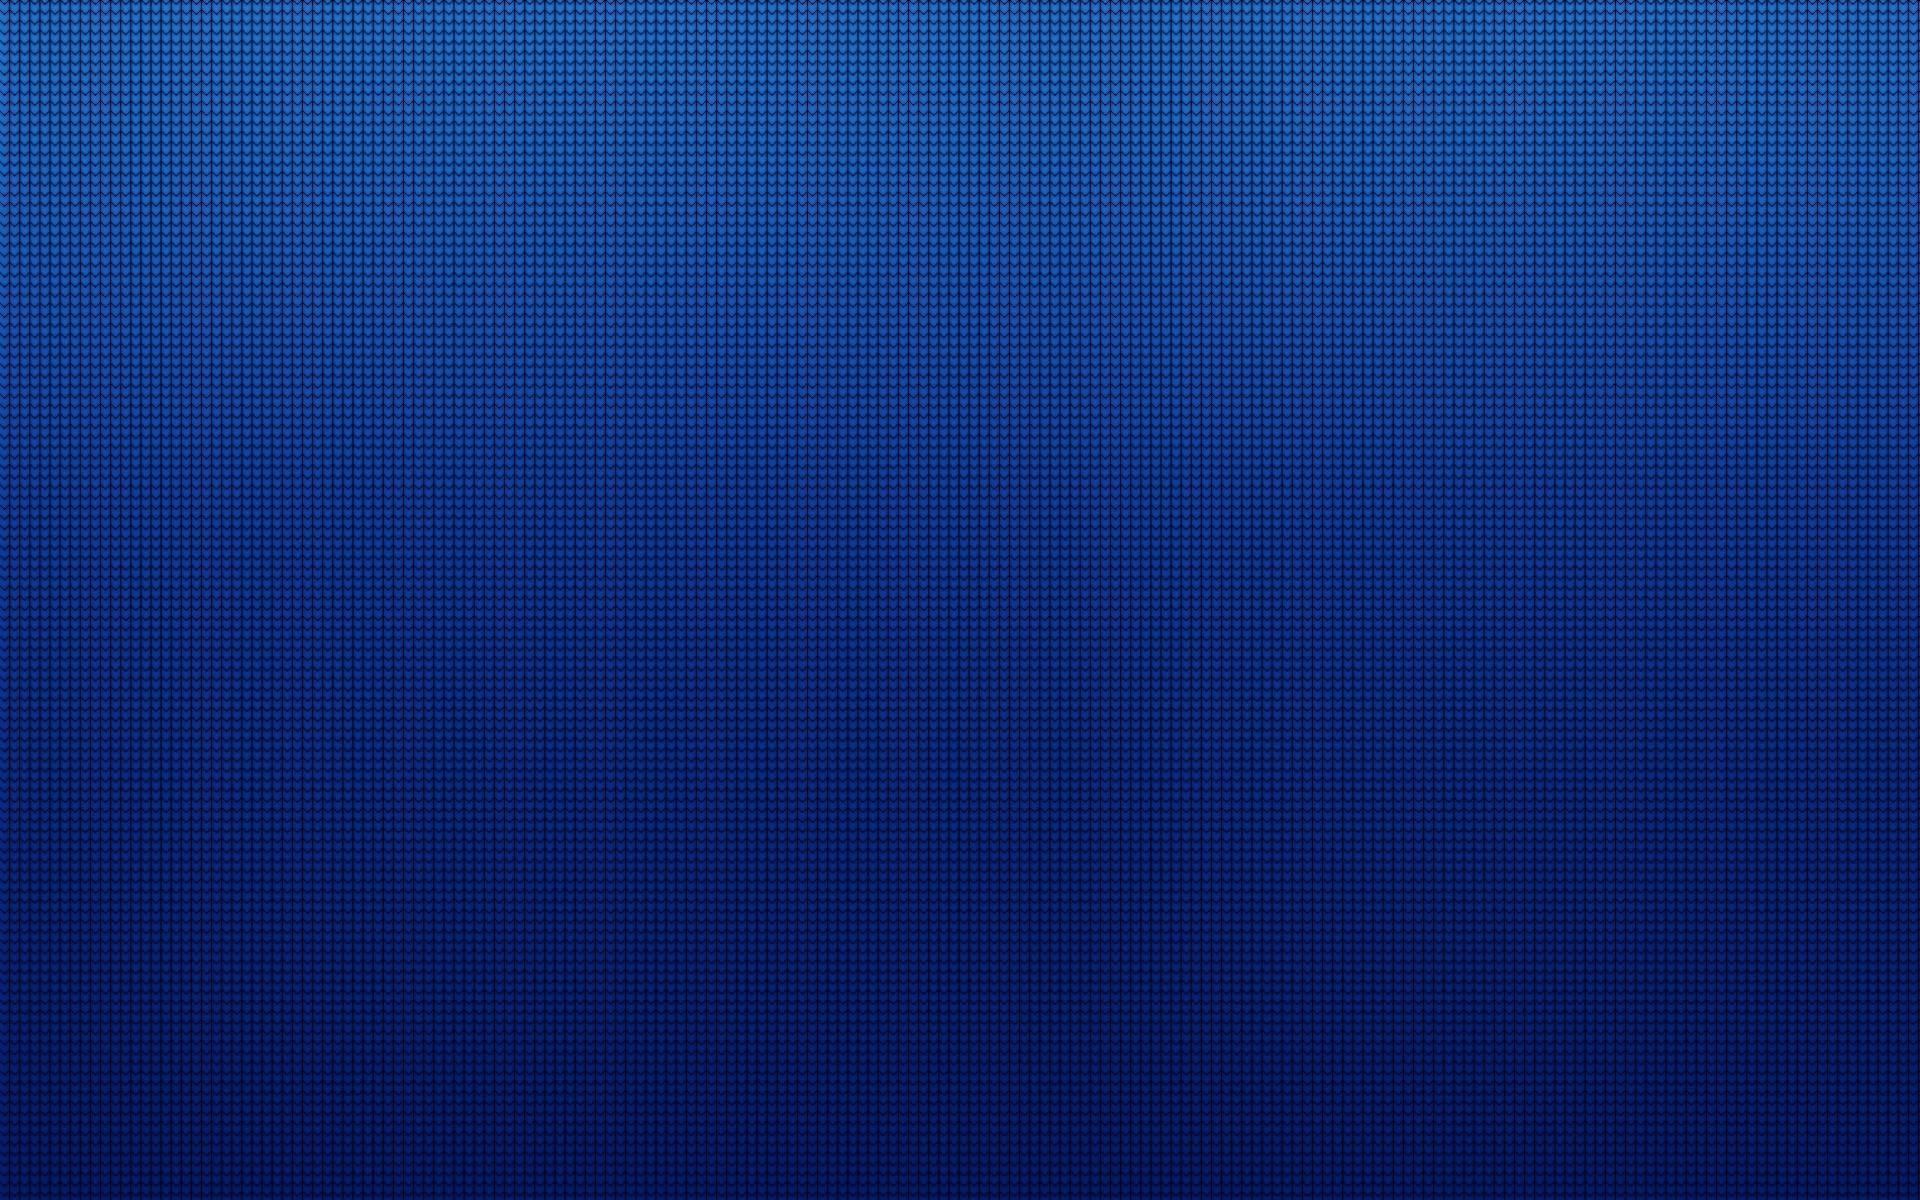 Dark Blue Free Background Pictures For Desktop #5131 Wallpaper .